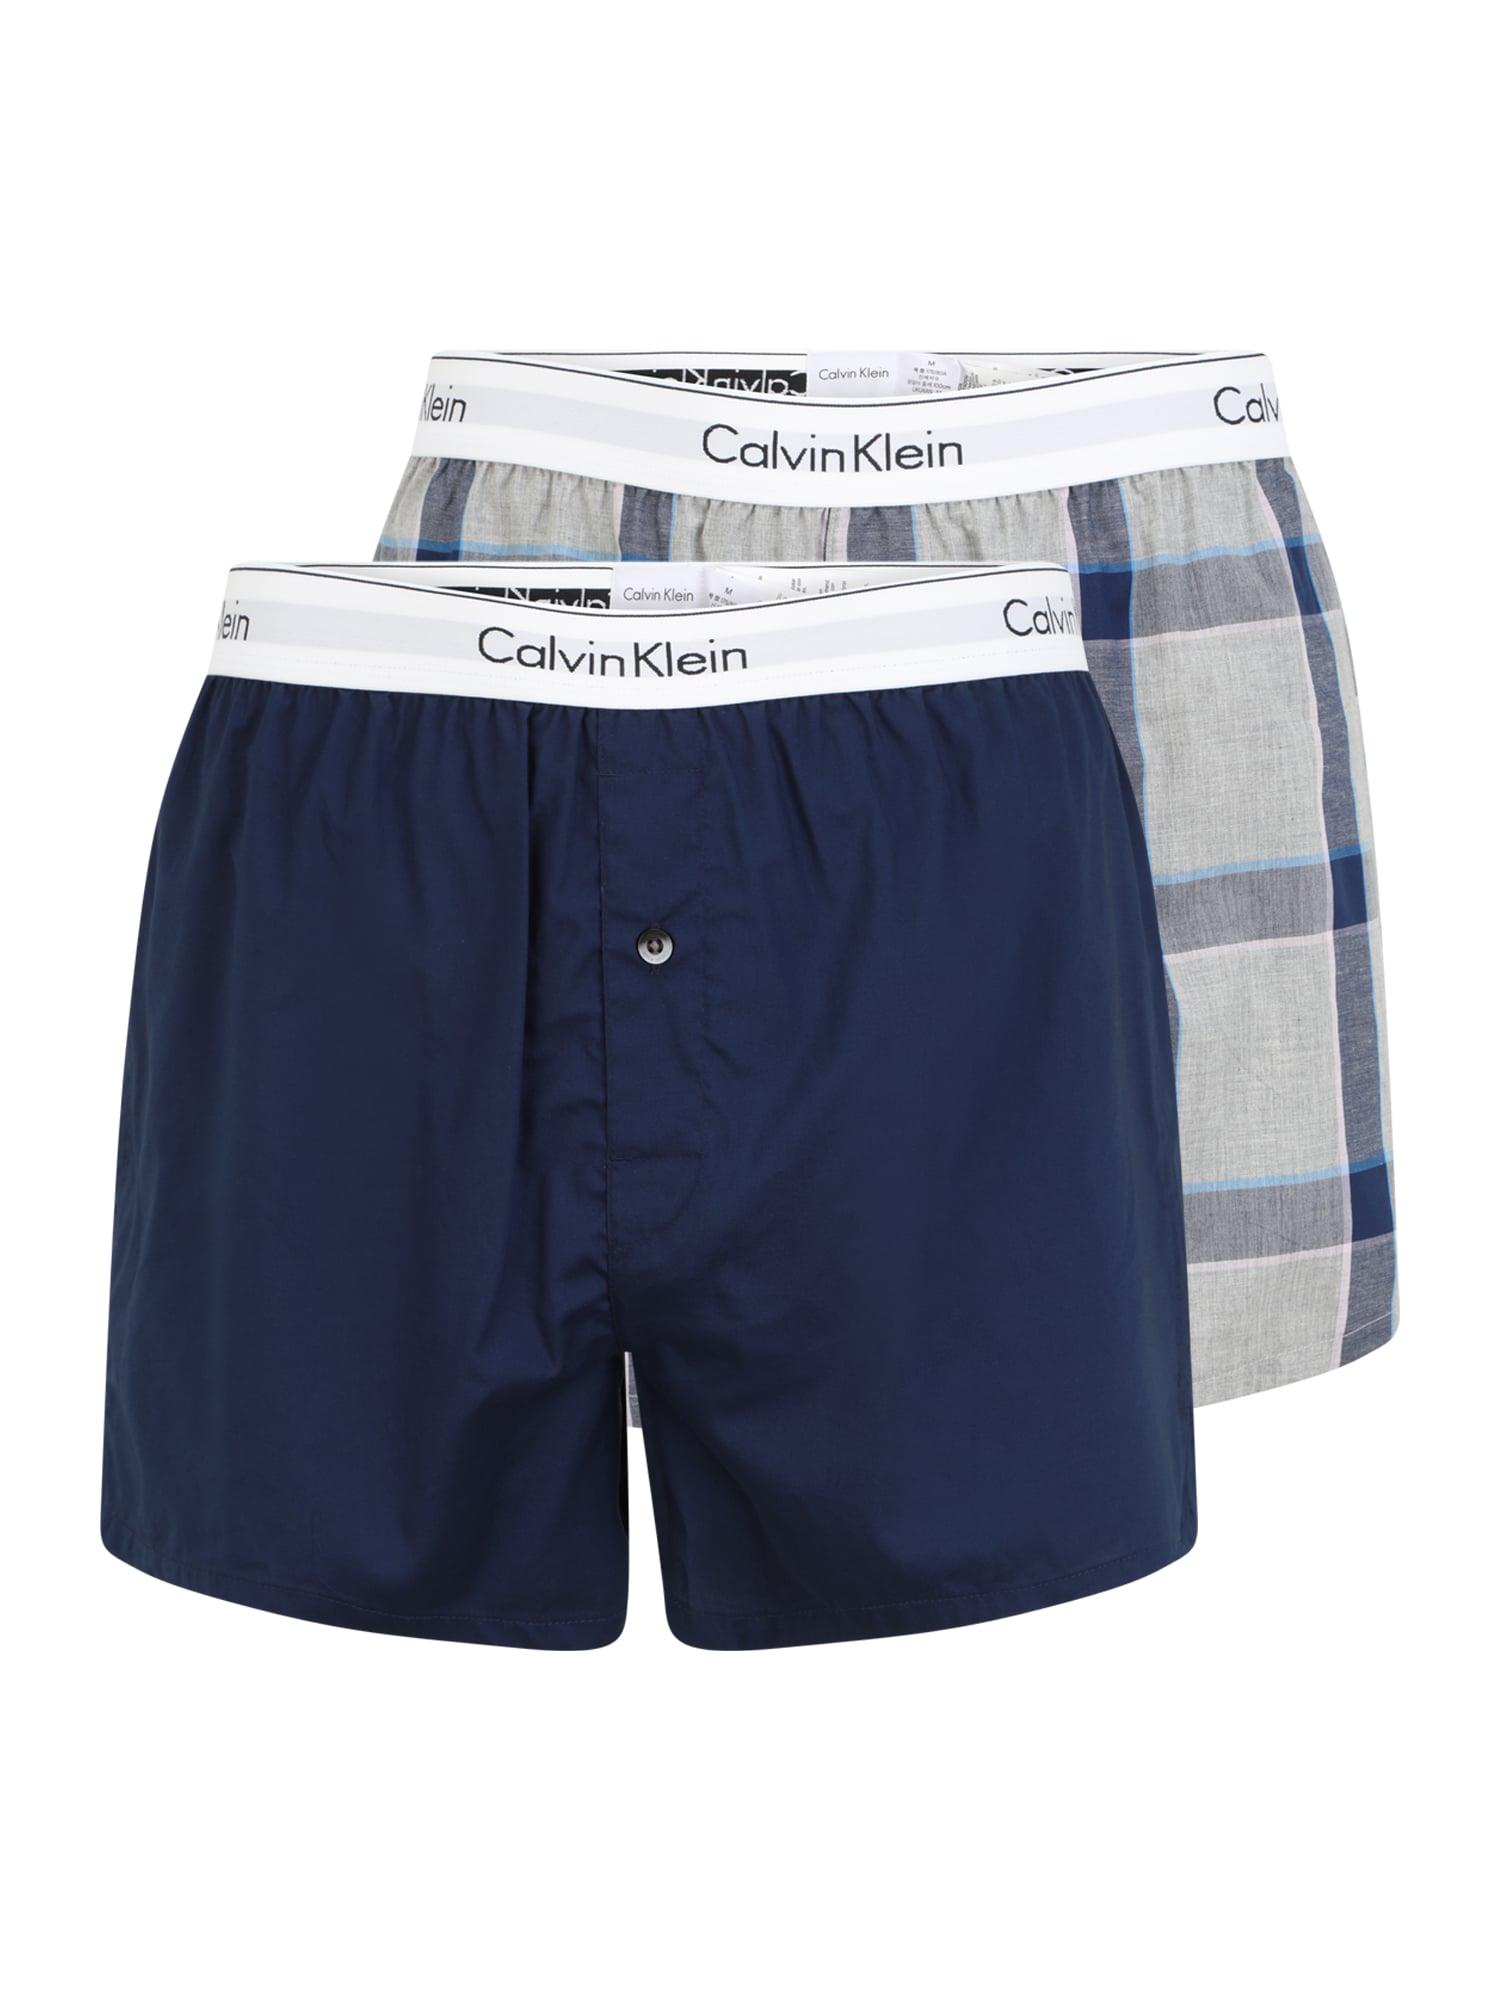 Calvin Klein Underwear Boxer trumpikės tamsiai mėlyna / balta / mėlyna dūmų spalva